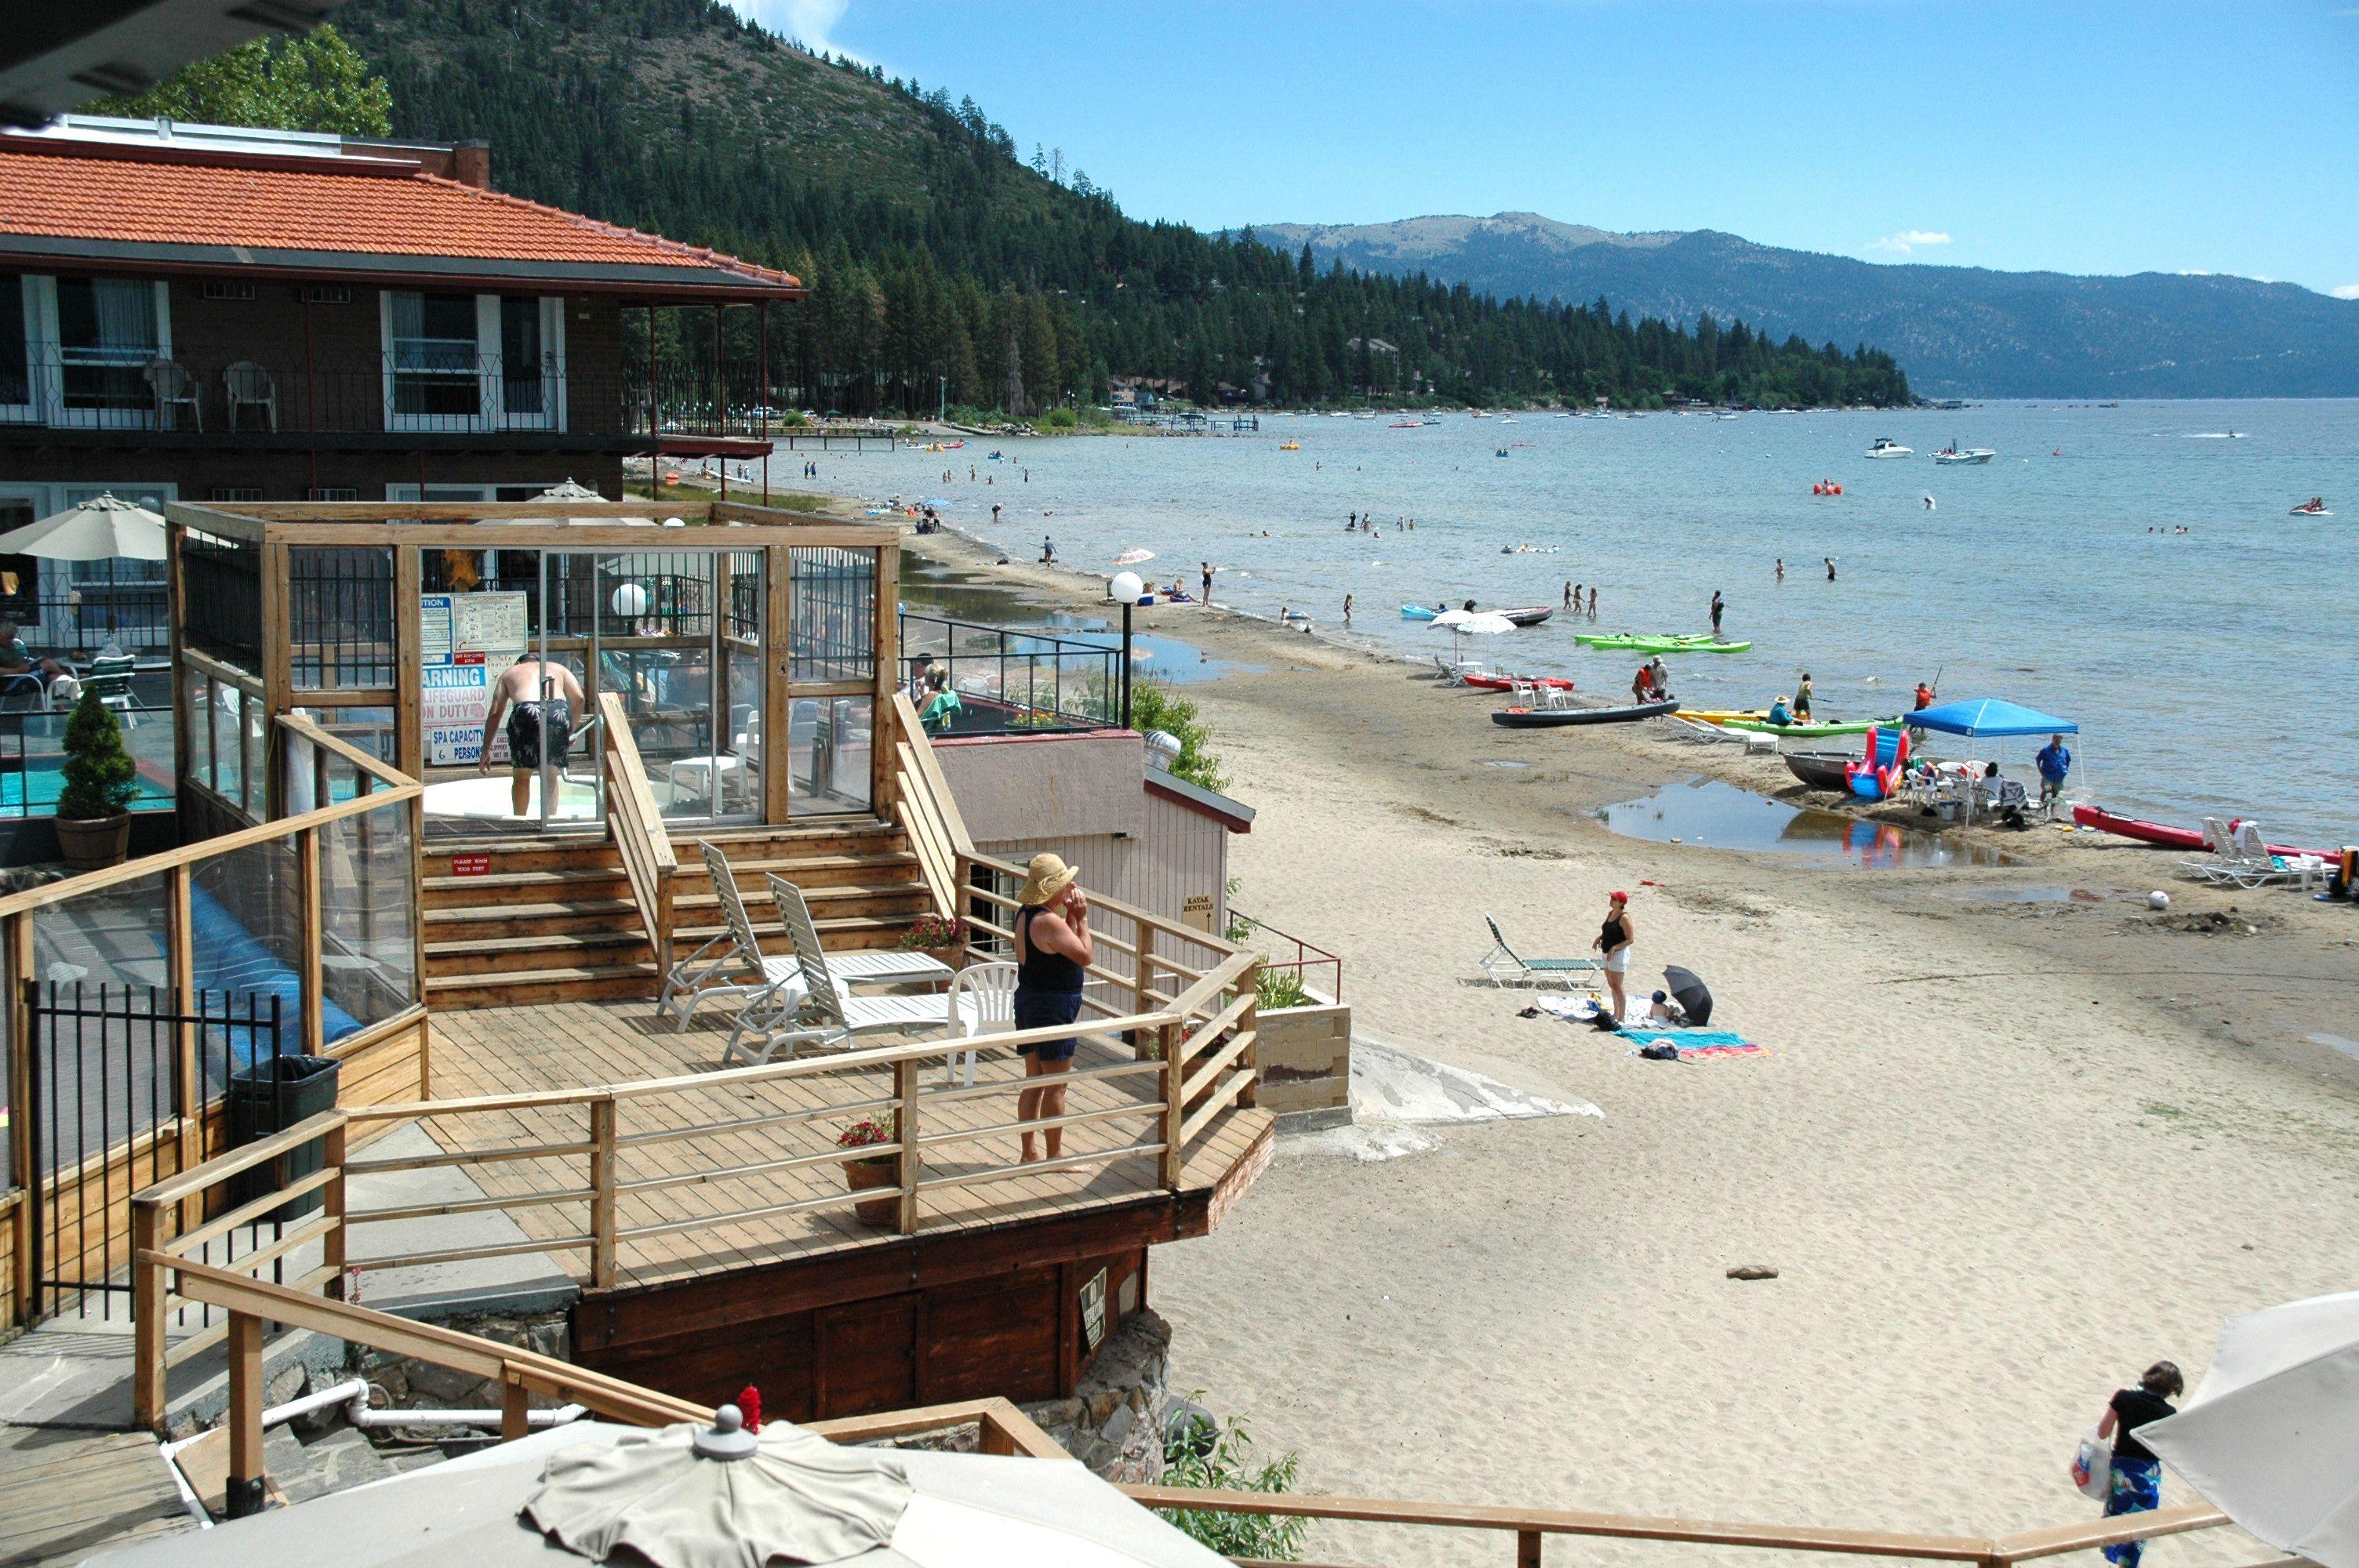 lake tahoe viewed from goldcrest motel in kings beach in. Black Bedroom Furniture Sets. Home Design Ideas